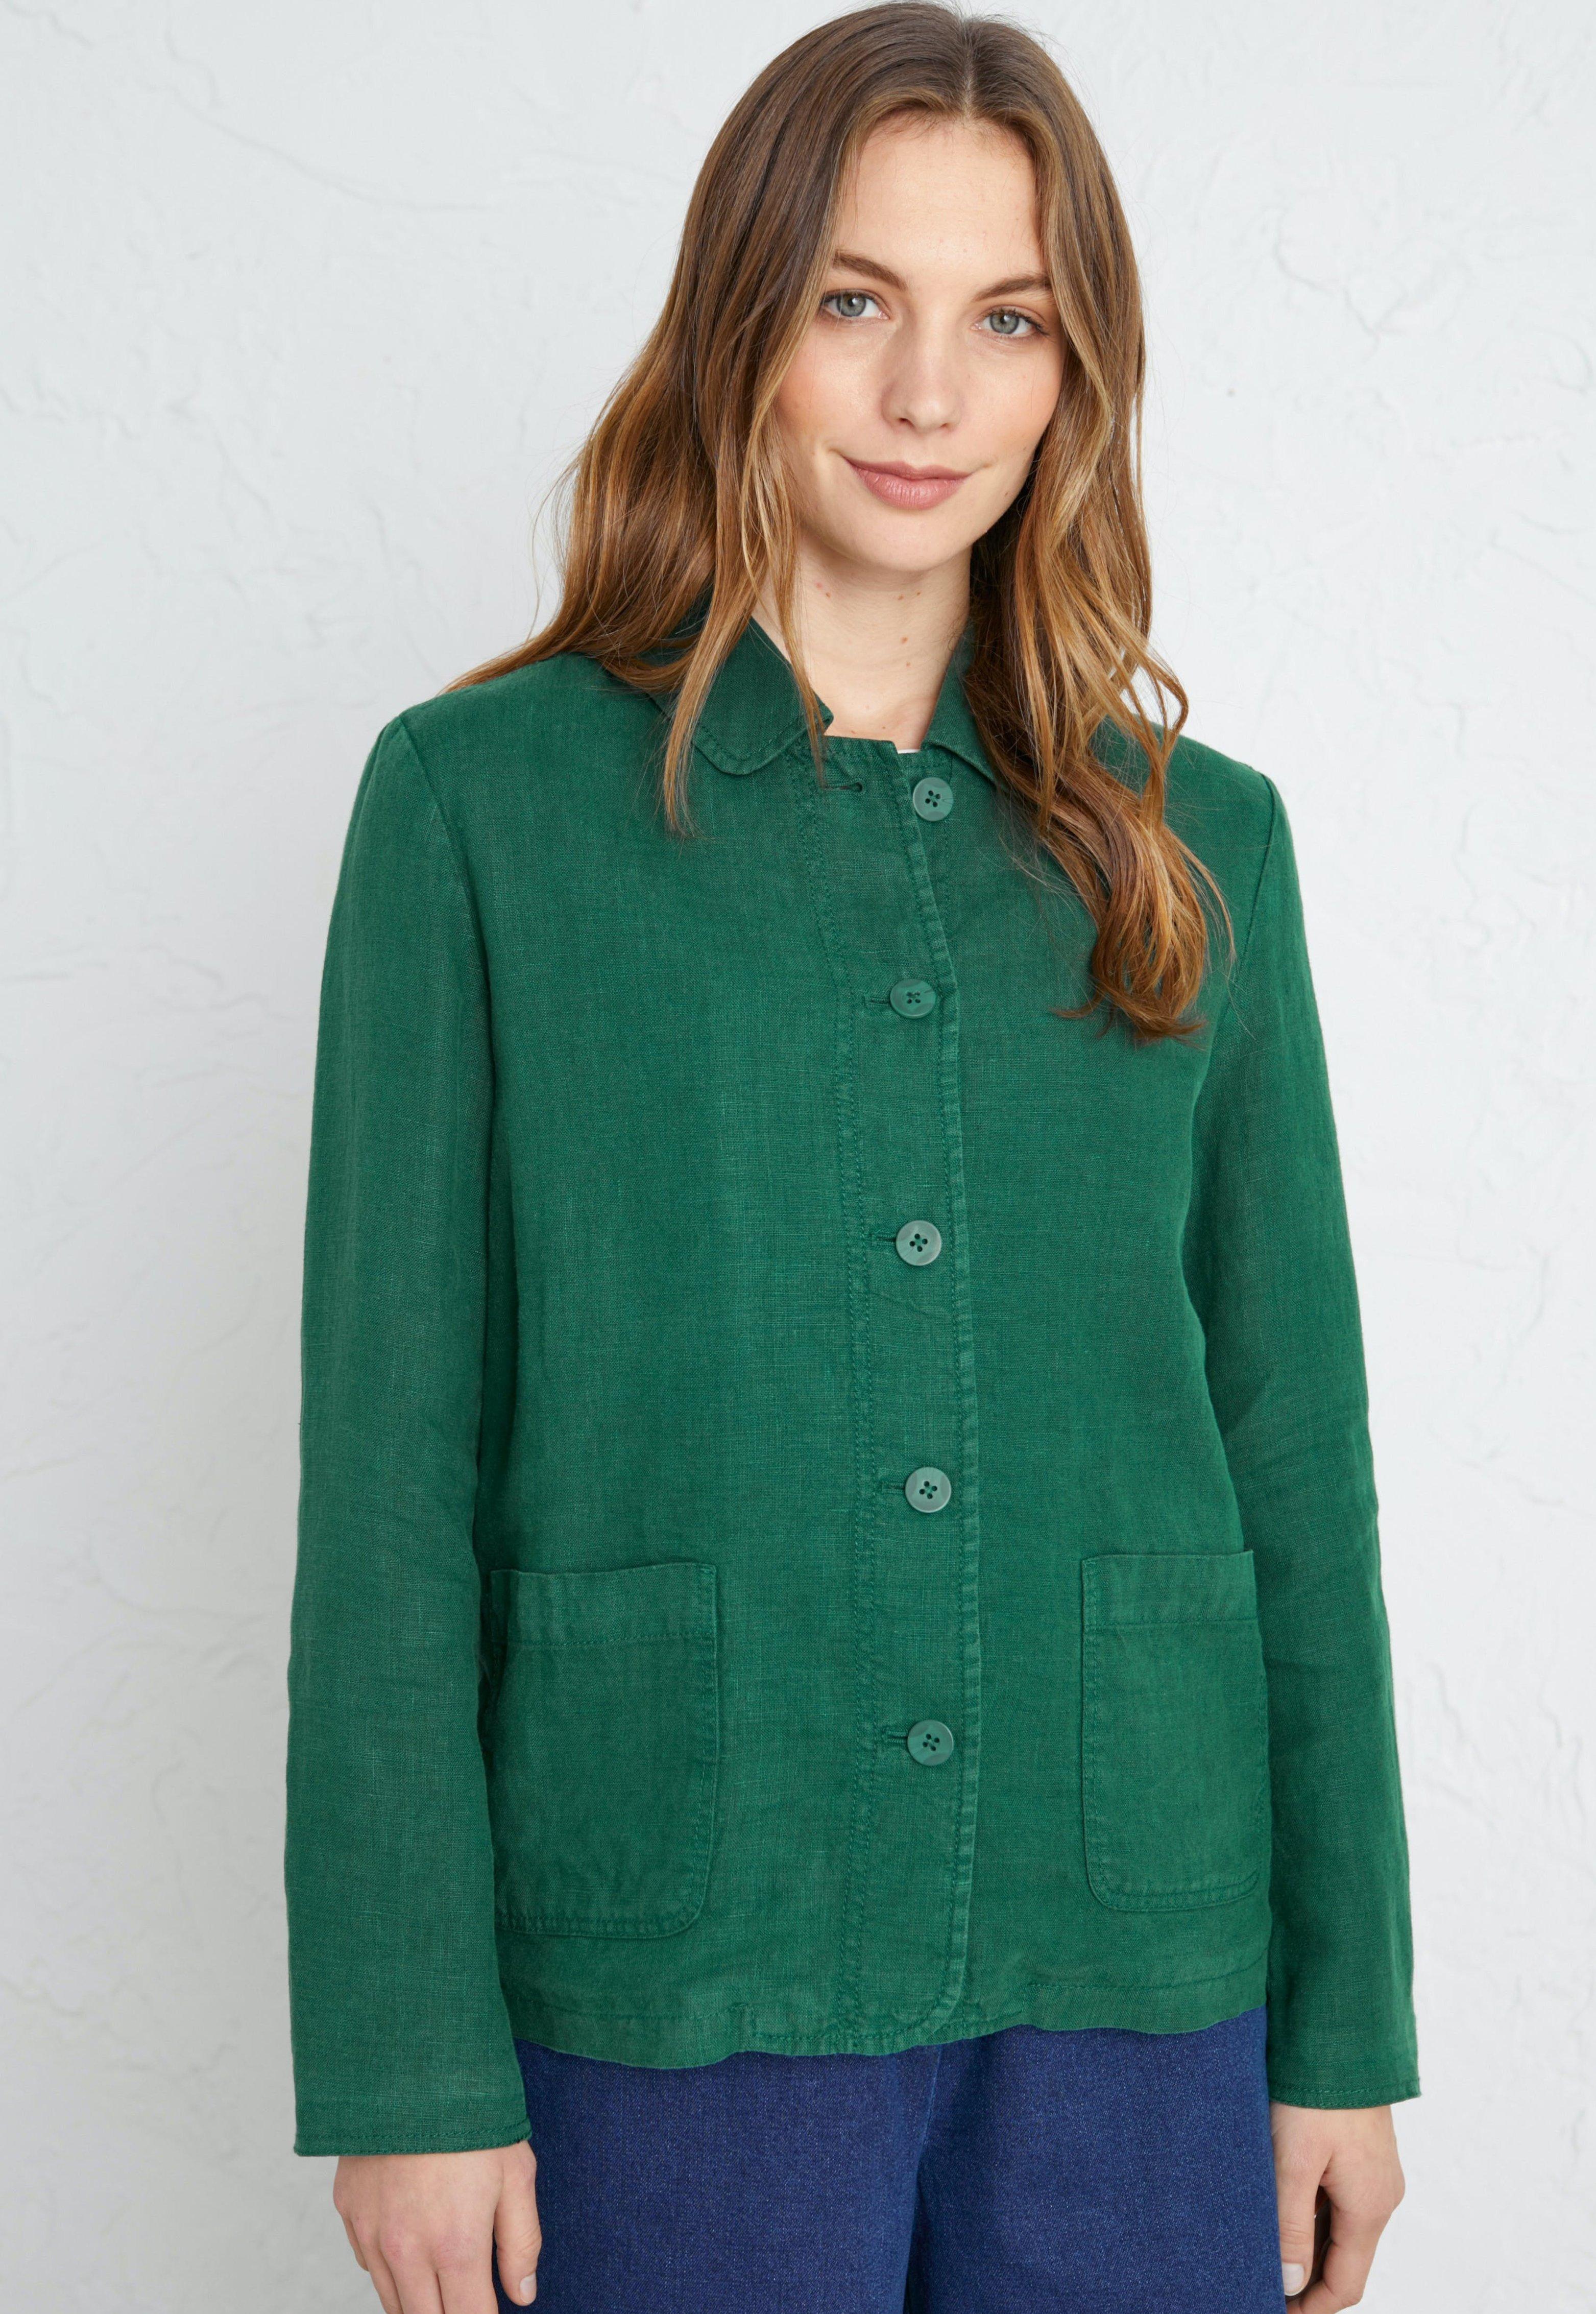 SEASALT Übergangsjacke - green | Damenbekleidung billig